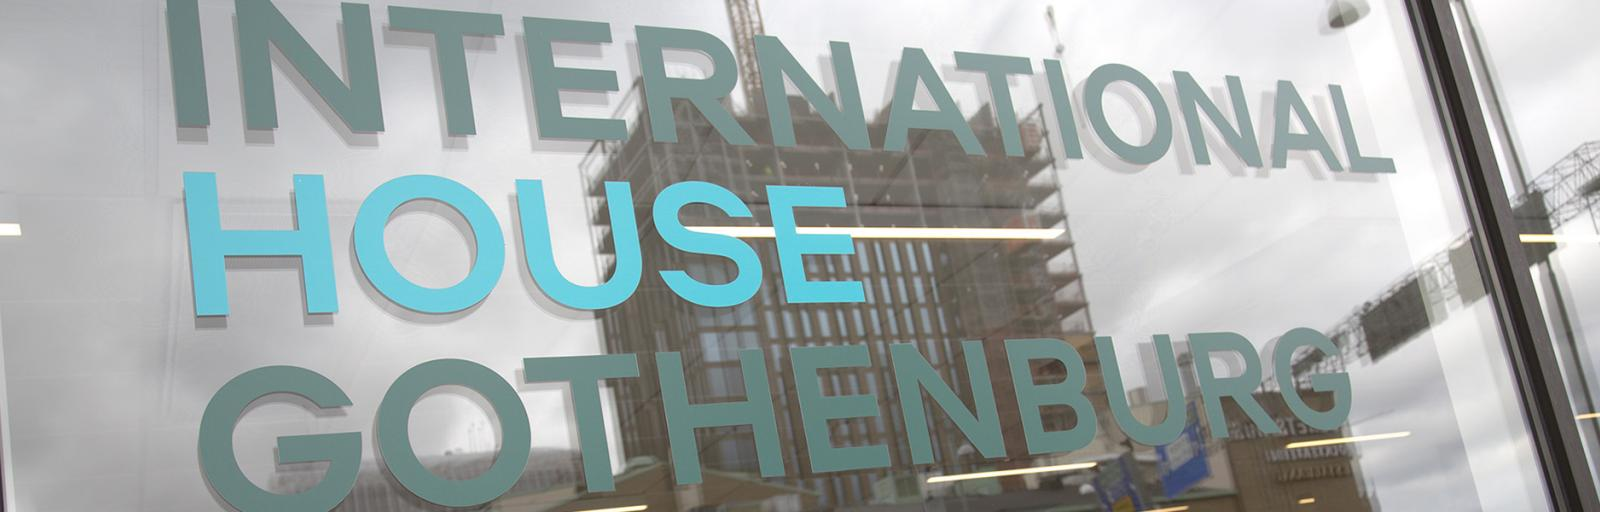 Window with text International House Gothenburg